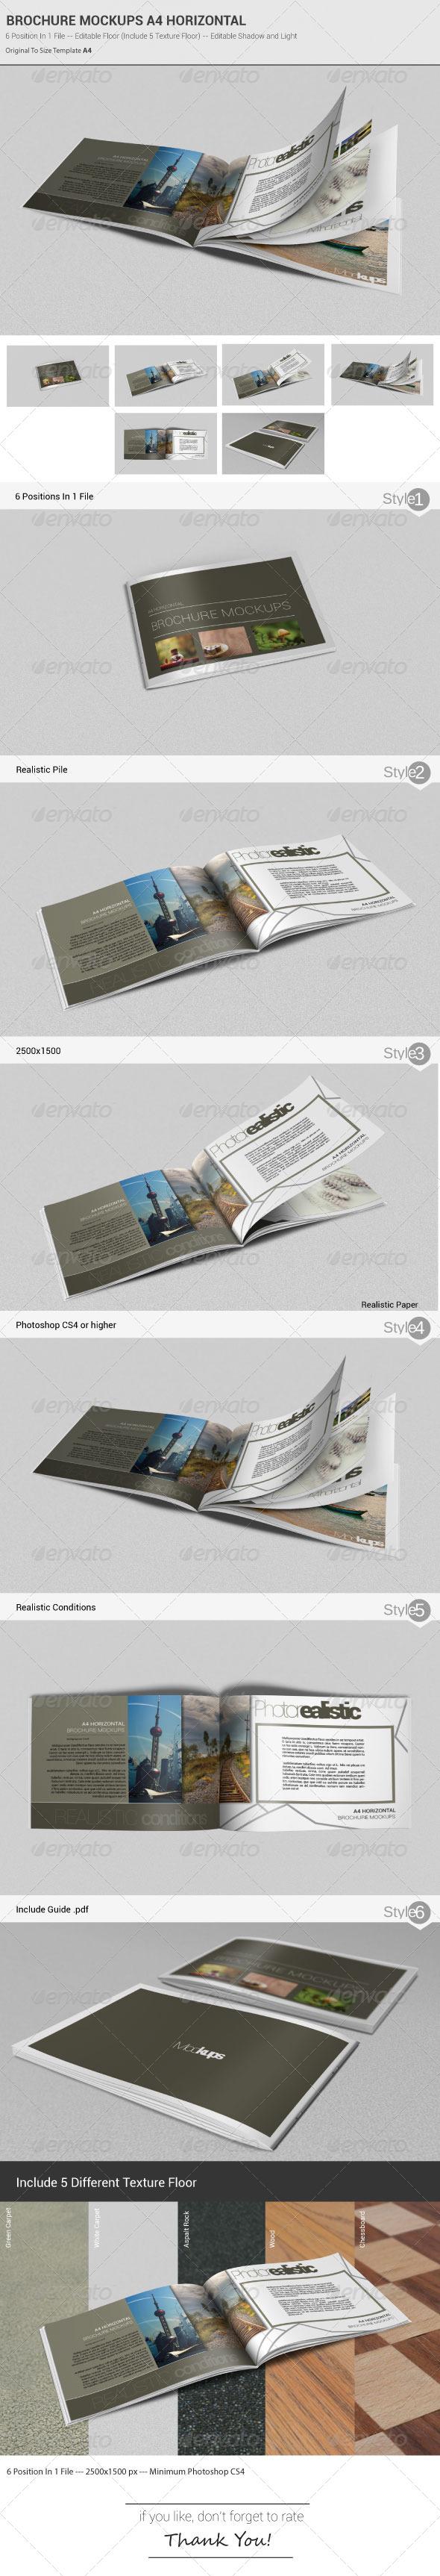 Brochure Mockups A4 Horizontal